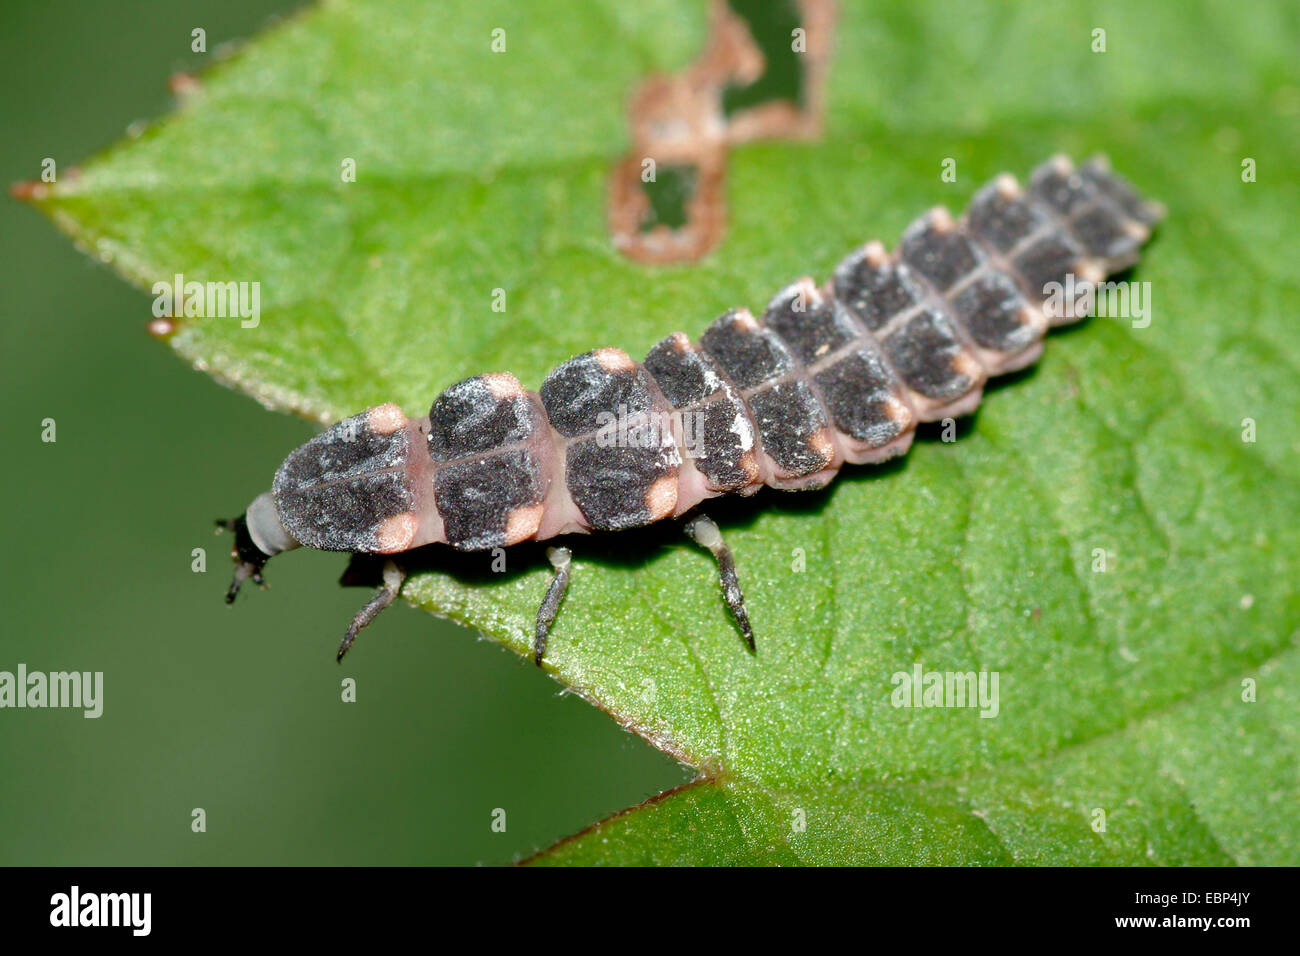 glowworm, glow-worm, great European glow-worm beetle (Lampyris noctiluca), larva on leaf, Germany - Stock Image